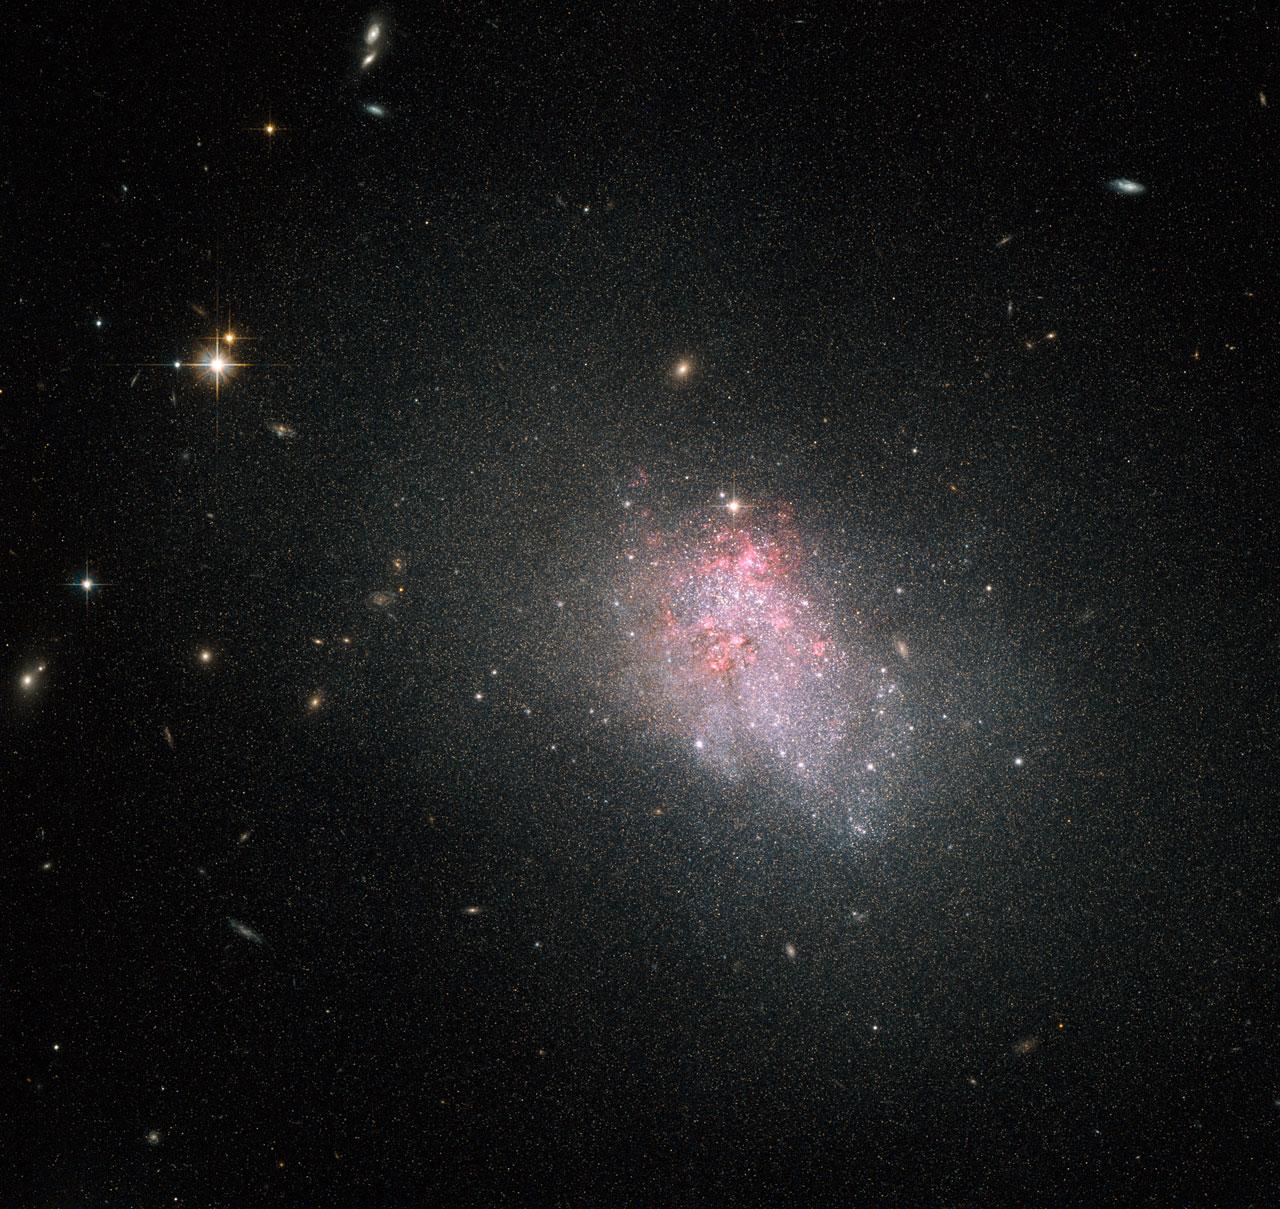 hubble irregular galaxy - photo #10